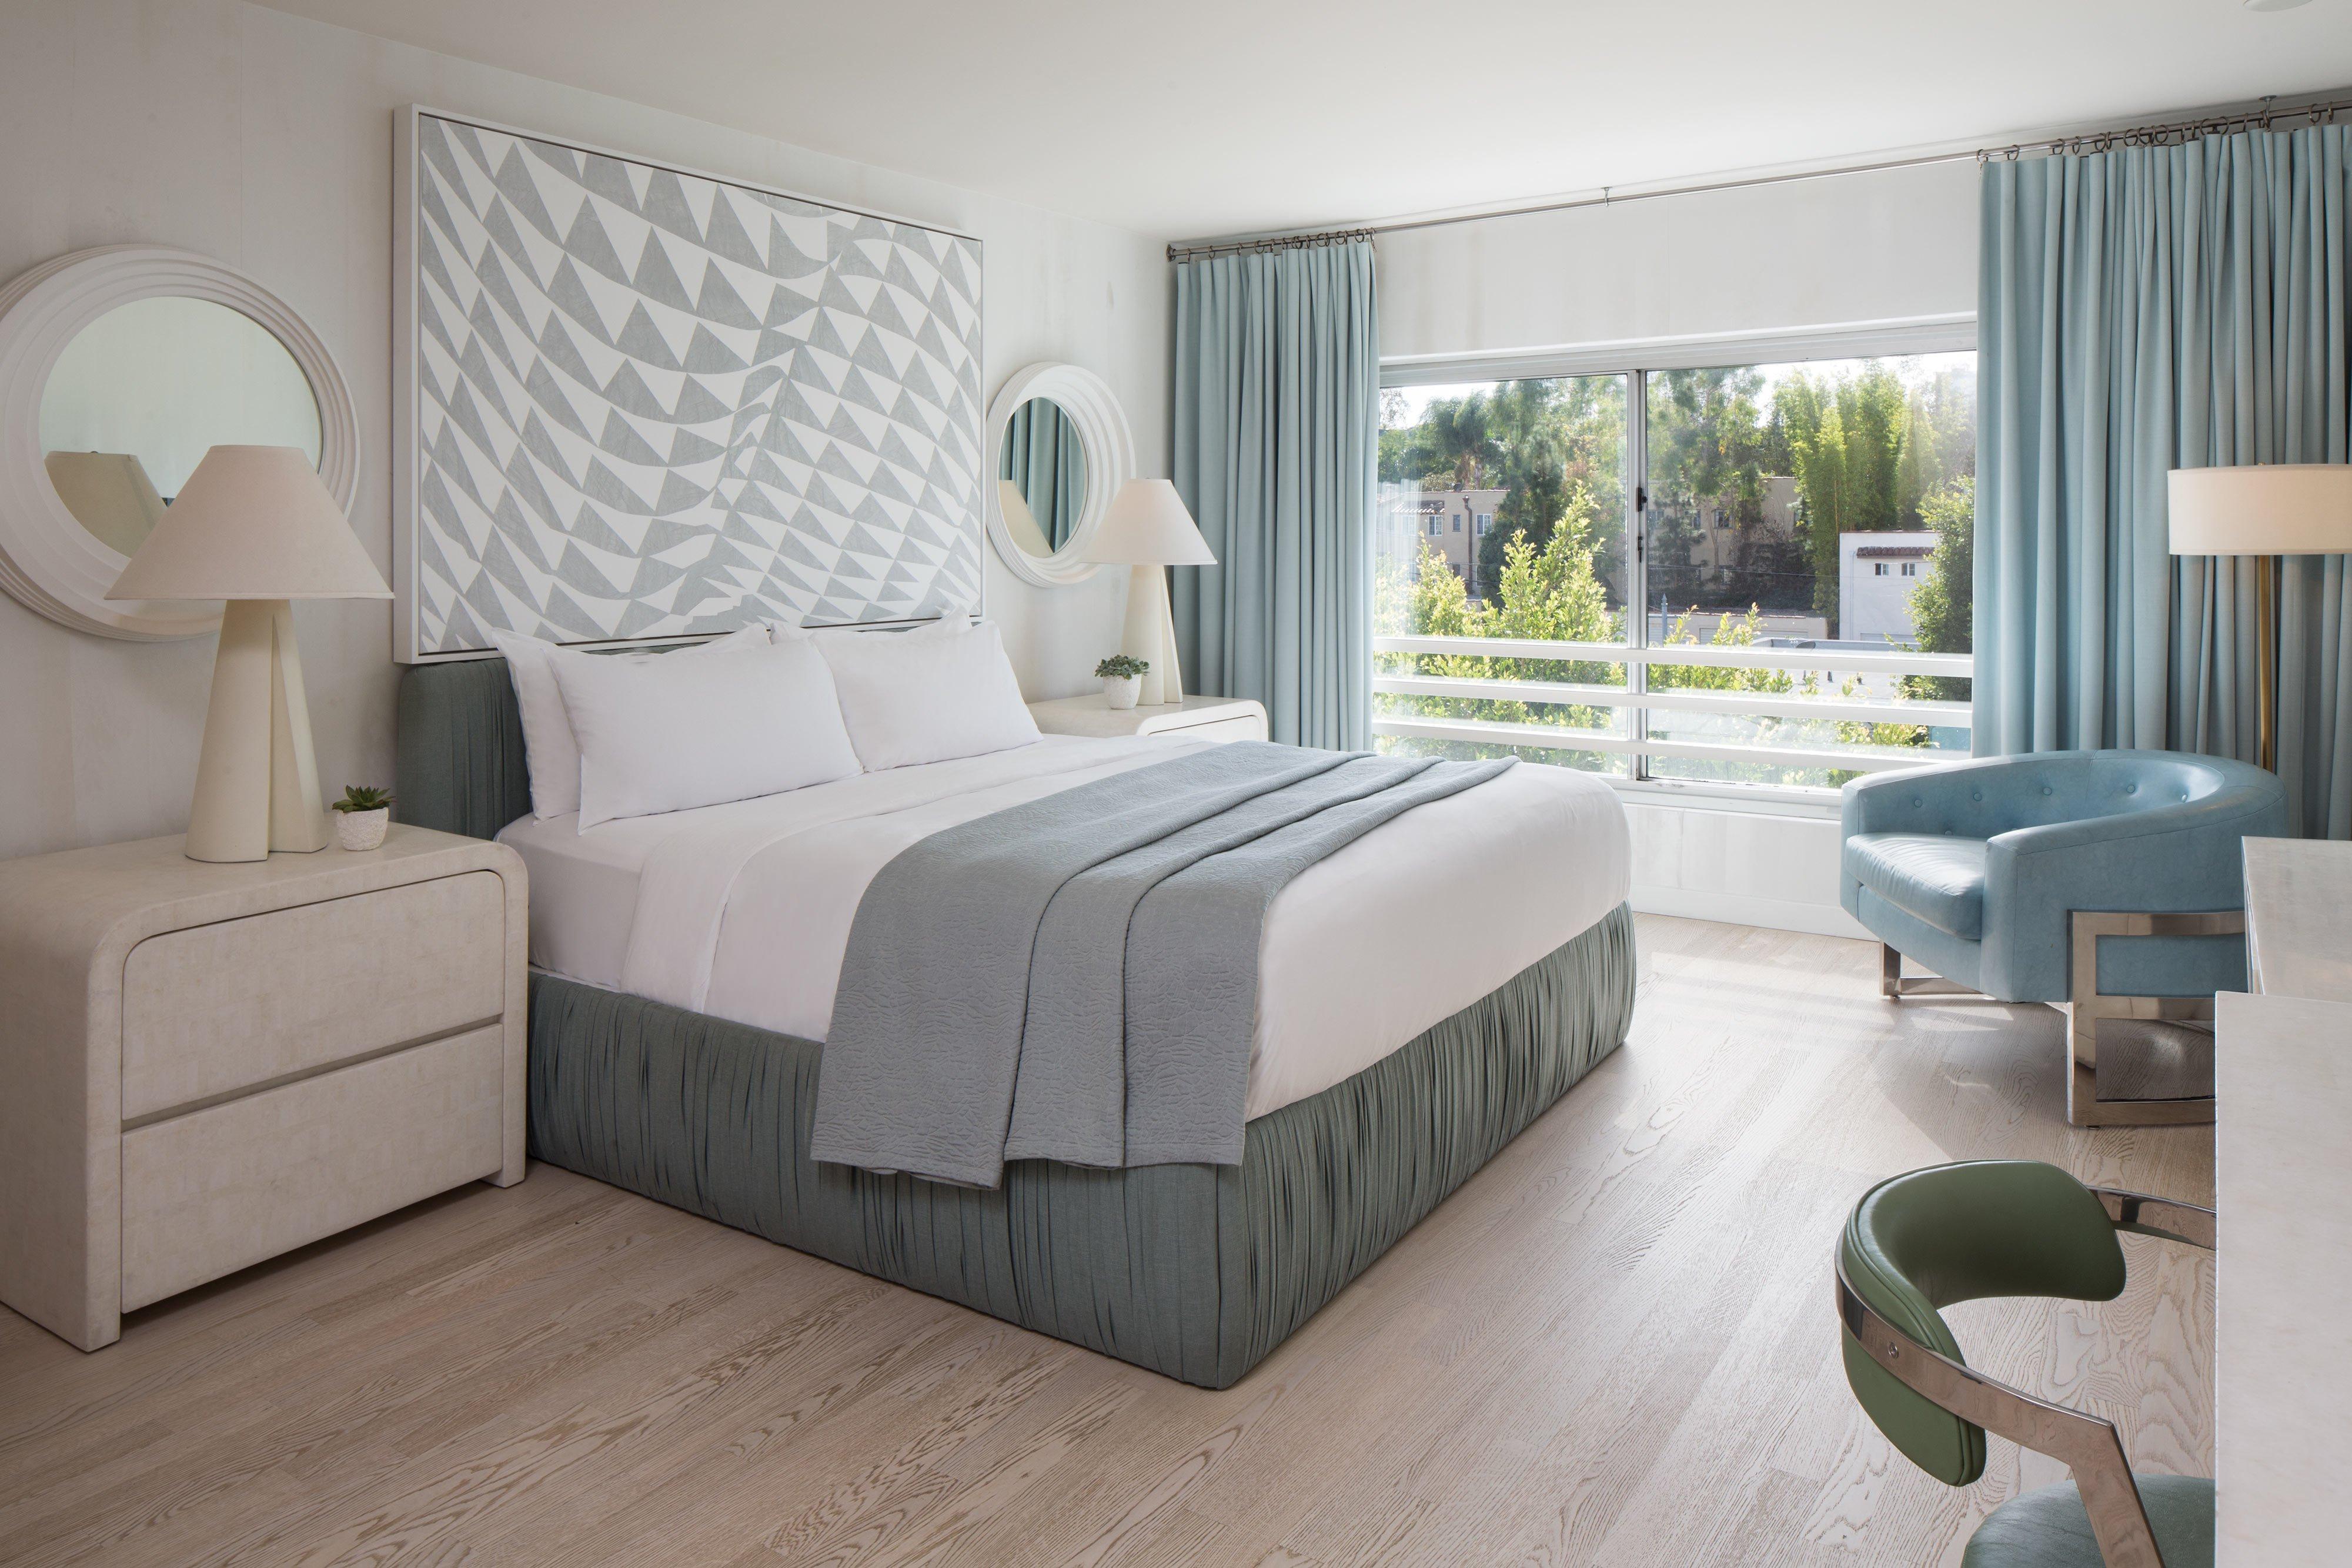 Avalon Hotel Beverly Hills, a Design Htl